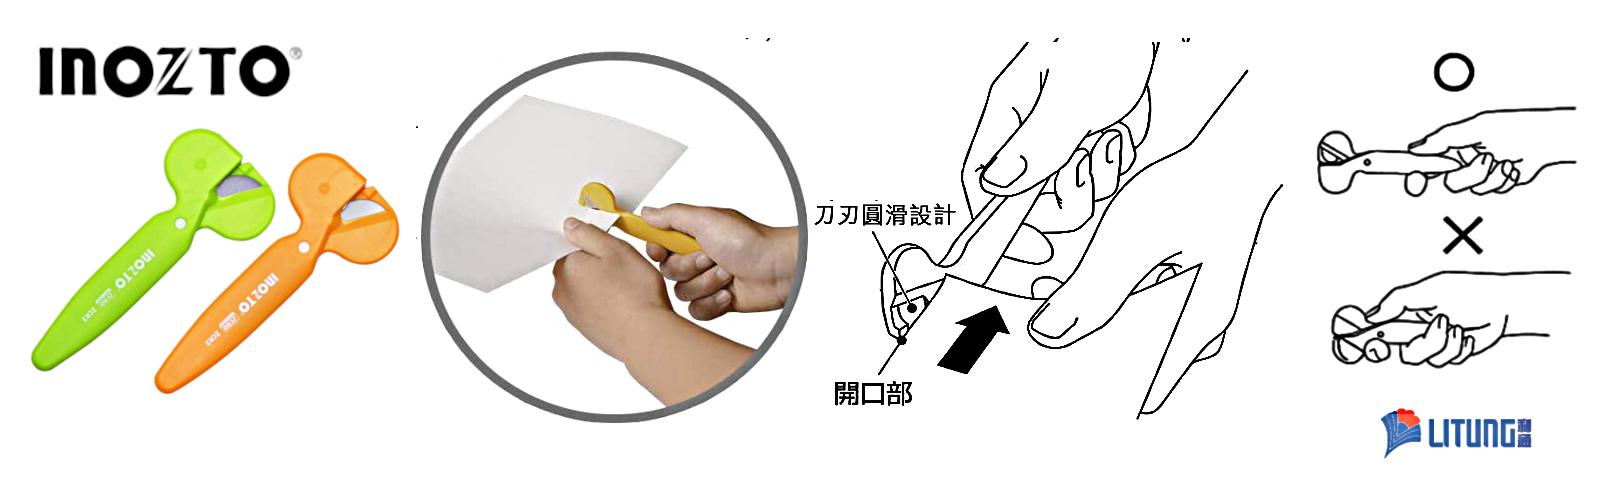 Banner Inozto R1 ZCR2 Grenn Orange Cutters 韓國製滾輪式剪刀 LTLogo 1600x500